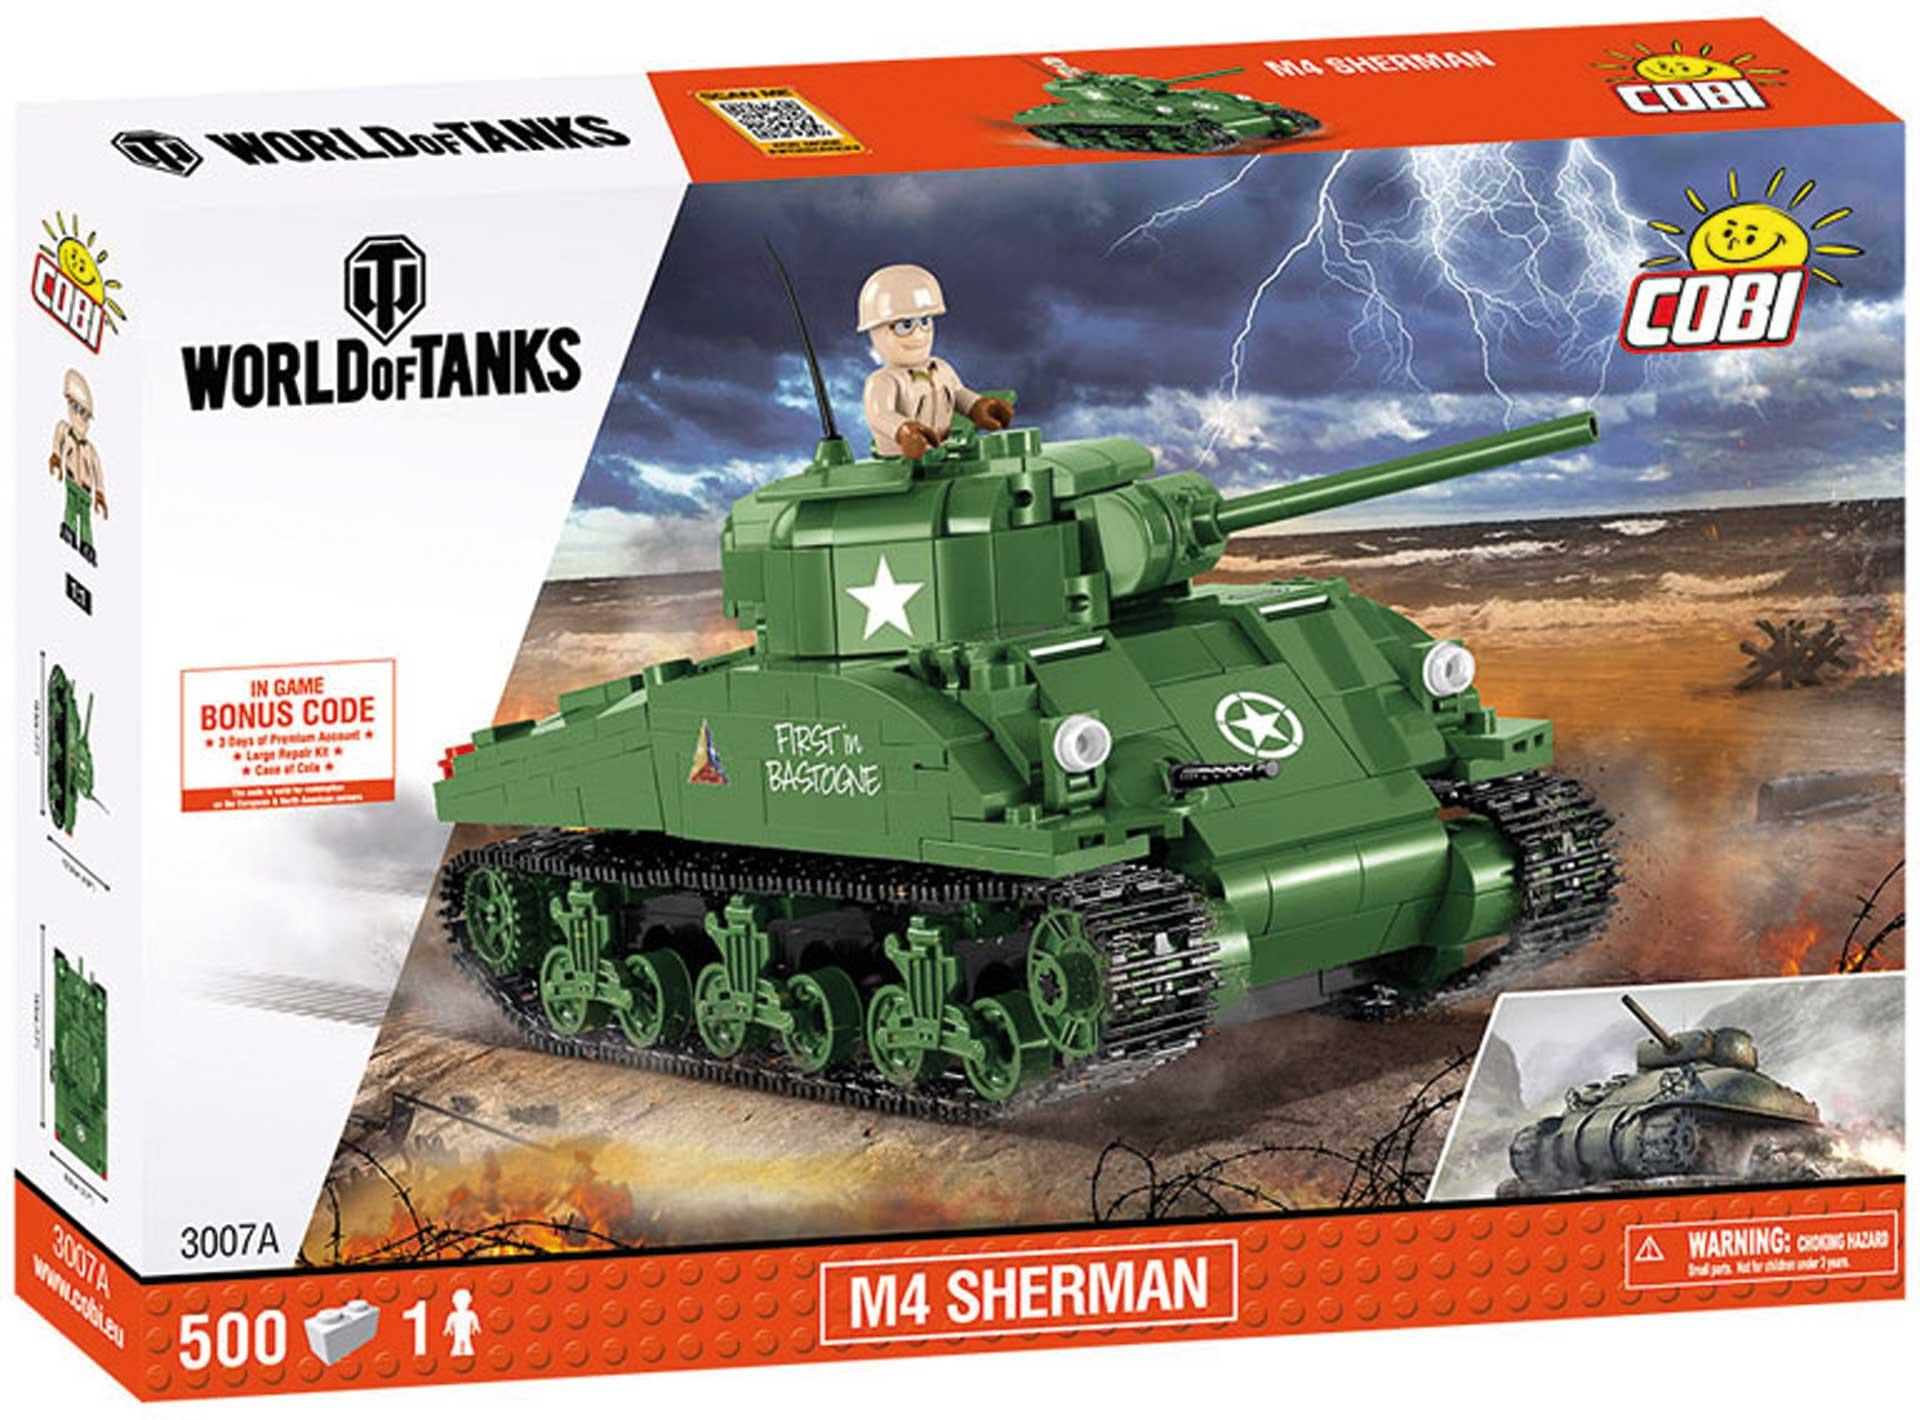 COBI M4 Sherman (500 Teile) (World of Tanks) Klemmbausteine